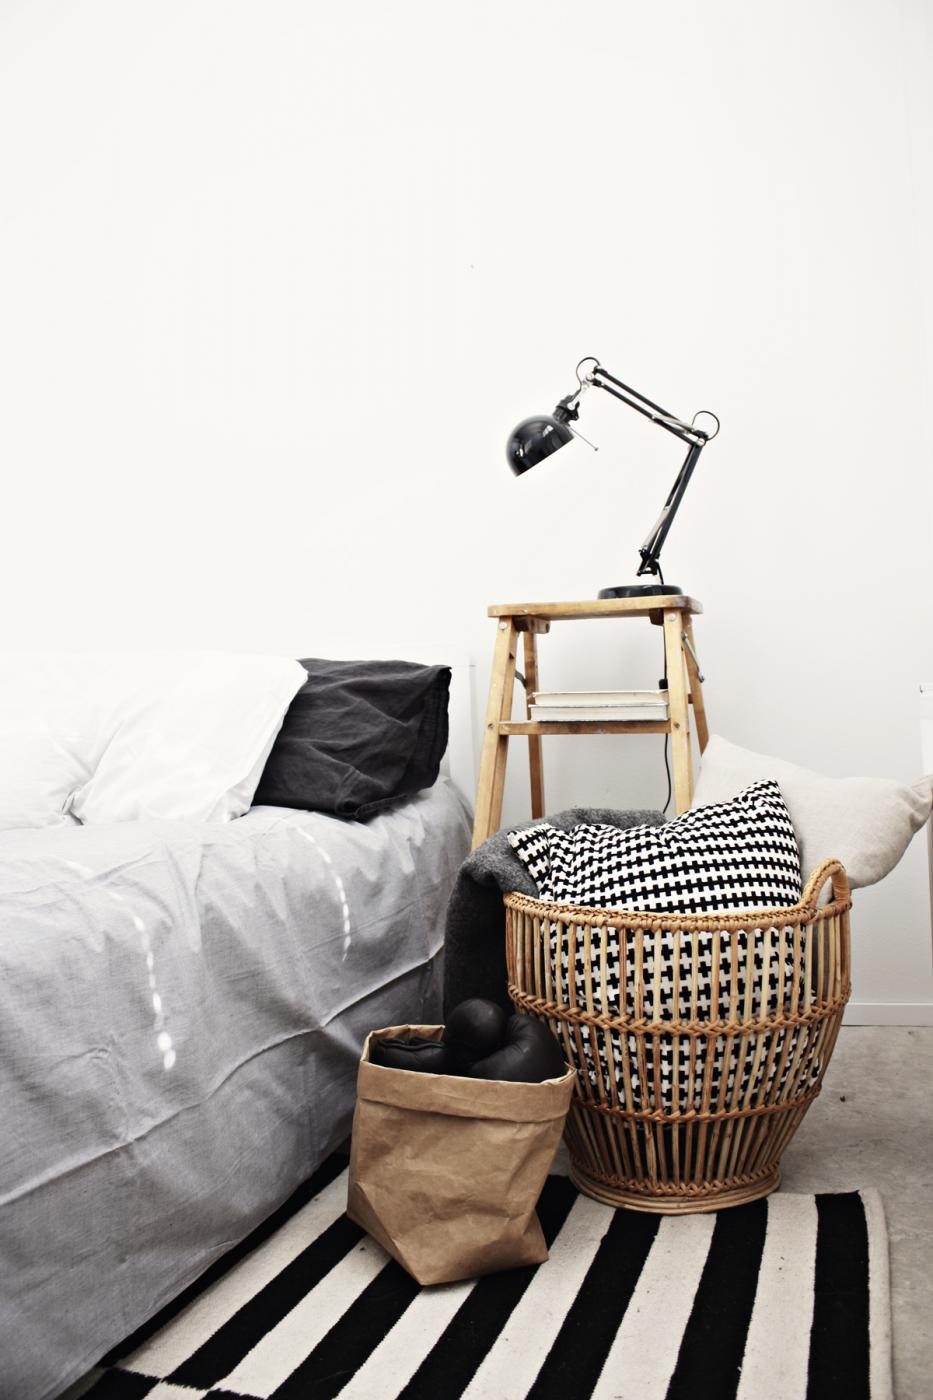 baskets_030.jpg